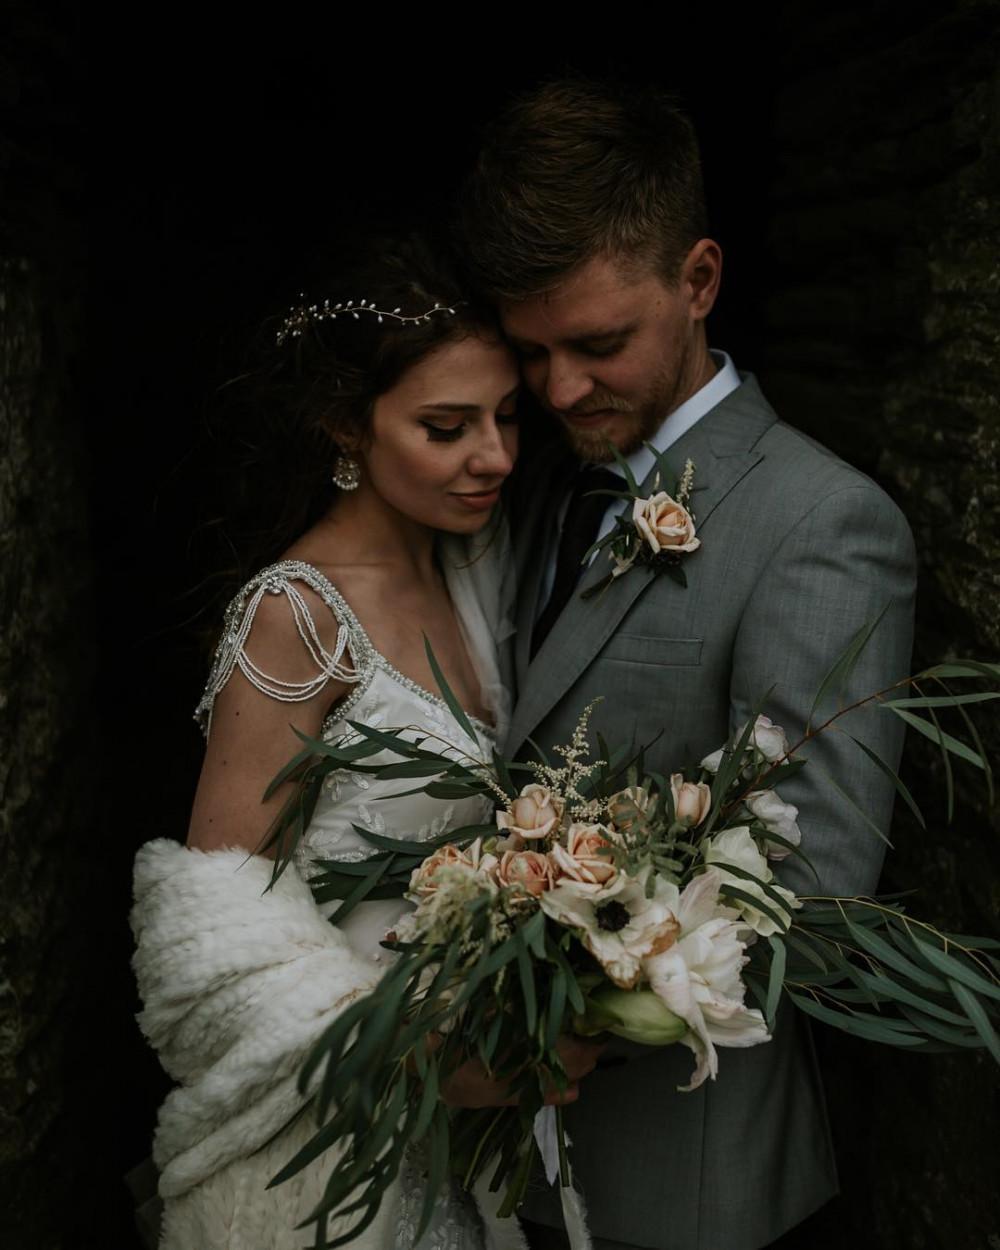 Ashley & Keith's Shell Grotto Wedding at Hotel Endsleigh - Make Me Bridal Artist: Amy Potter Makeup Artist. Photography by: Enchanted Brides. #vintage #glamorous #curls #weddingmorning #bridalmakeup #rustic #relaxedupdo #elopement #runawaywithme #weddinginspo #cornishbrides #intimatewedding #cornwallsmakeupartist #cornishmakeupartist